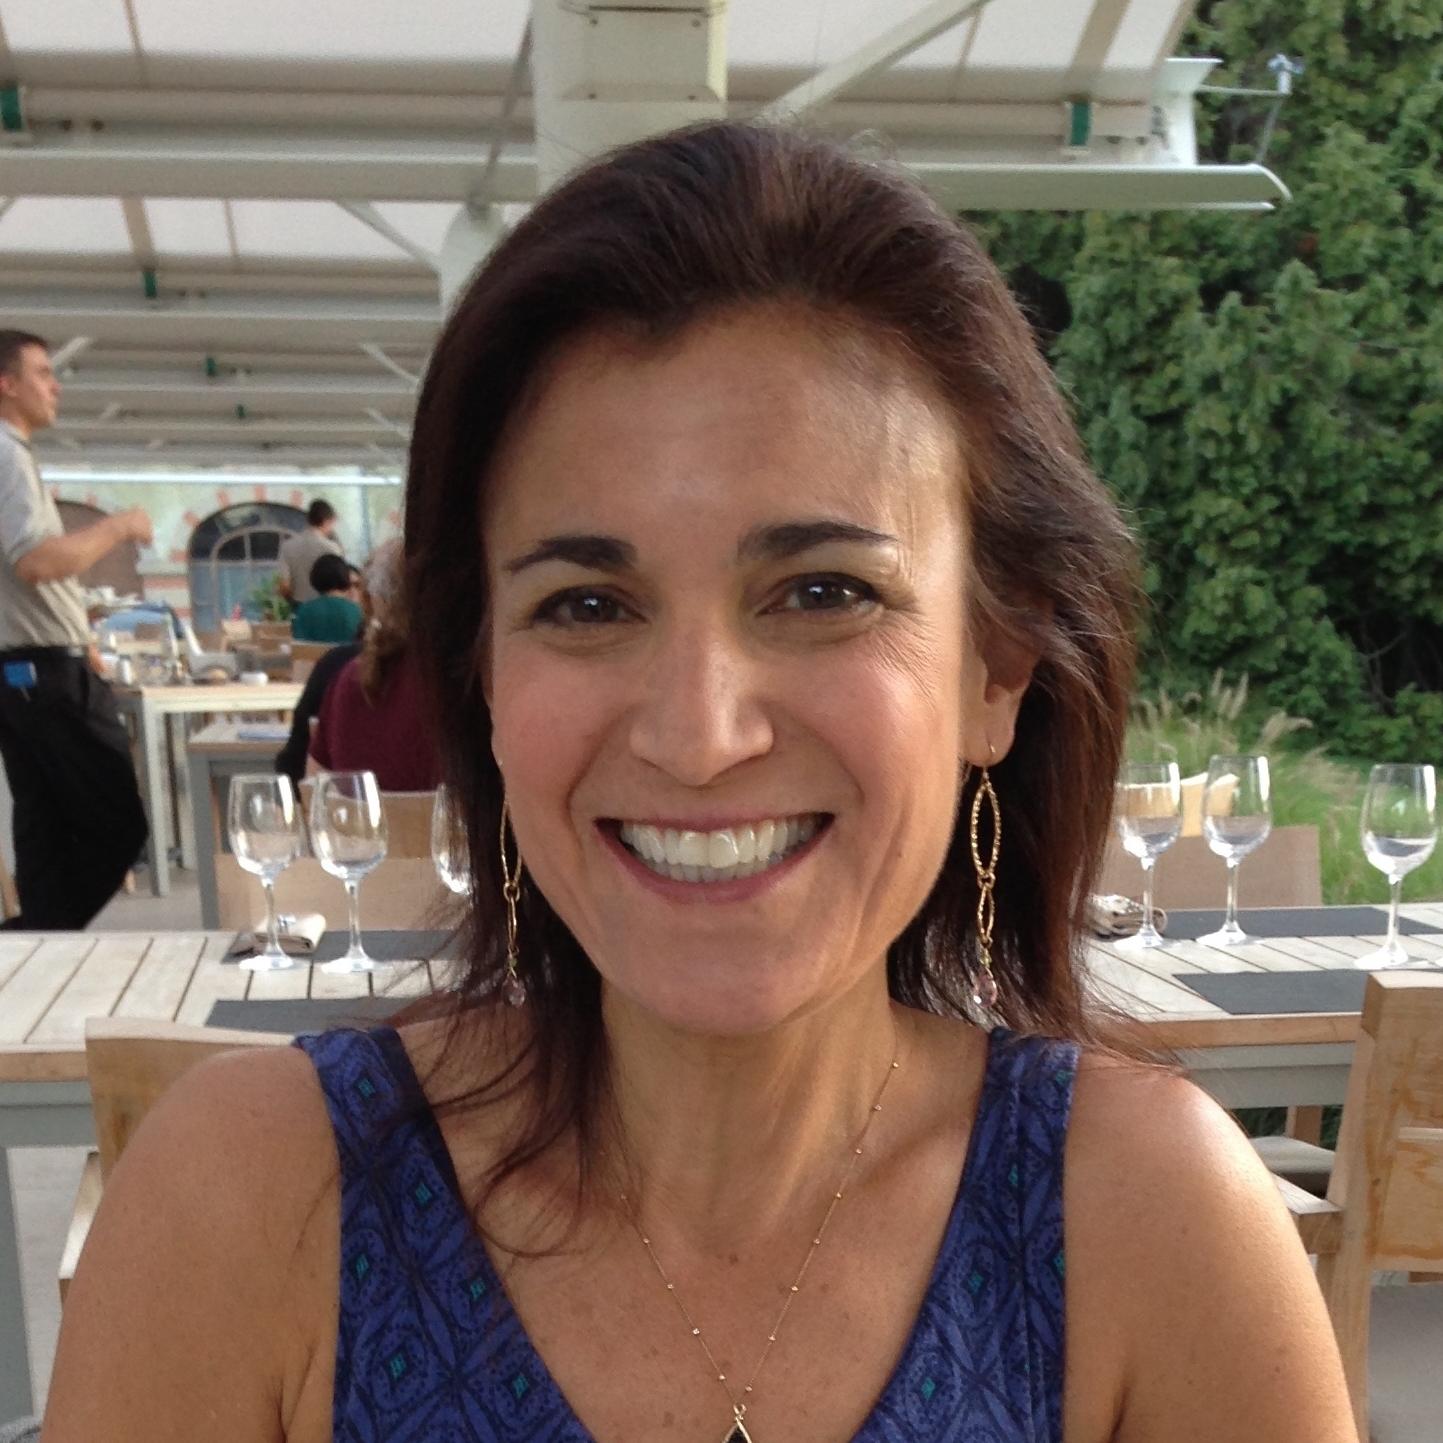 Susan connolly physician meruhealth healthcare professional.jpg